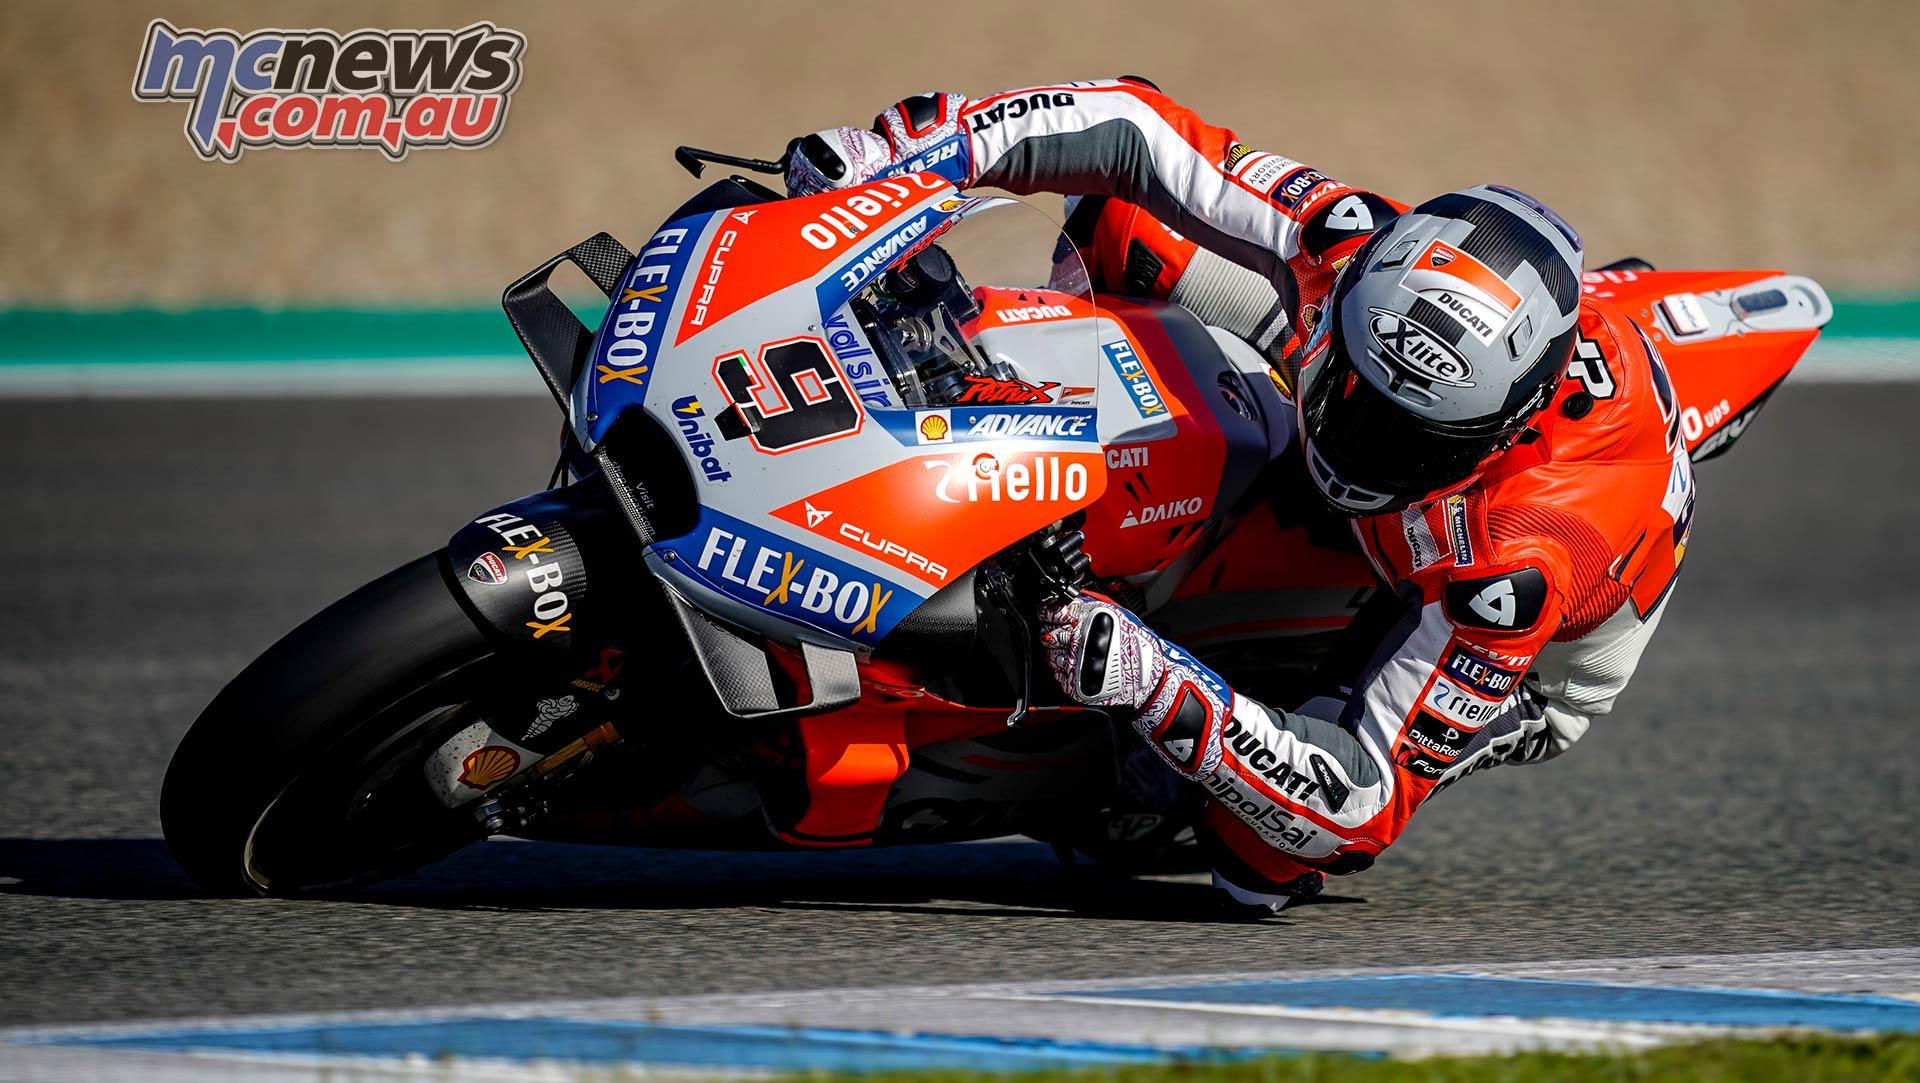 Danilo Petrucci tops opening day of Jerez MotoGP Test | MCNews.com.au